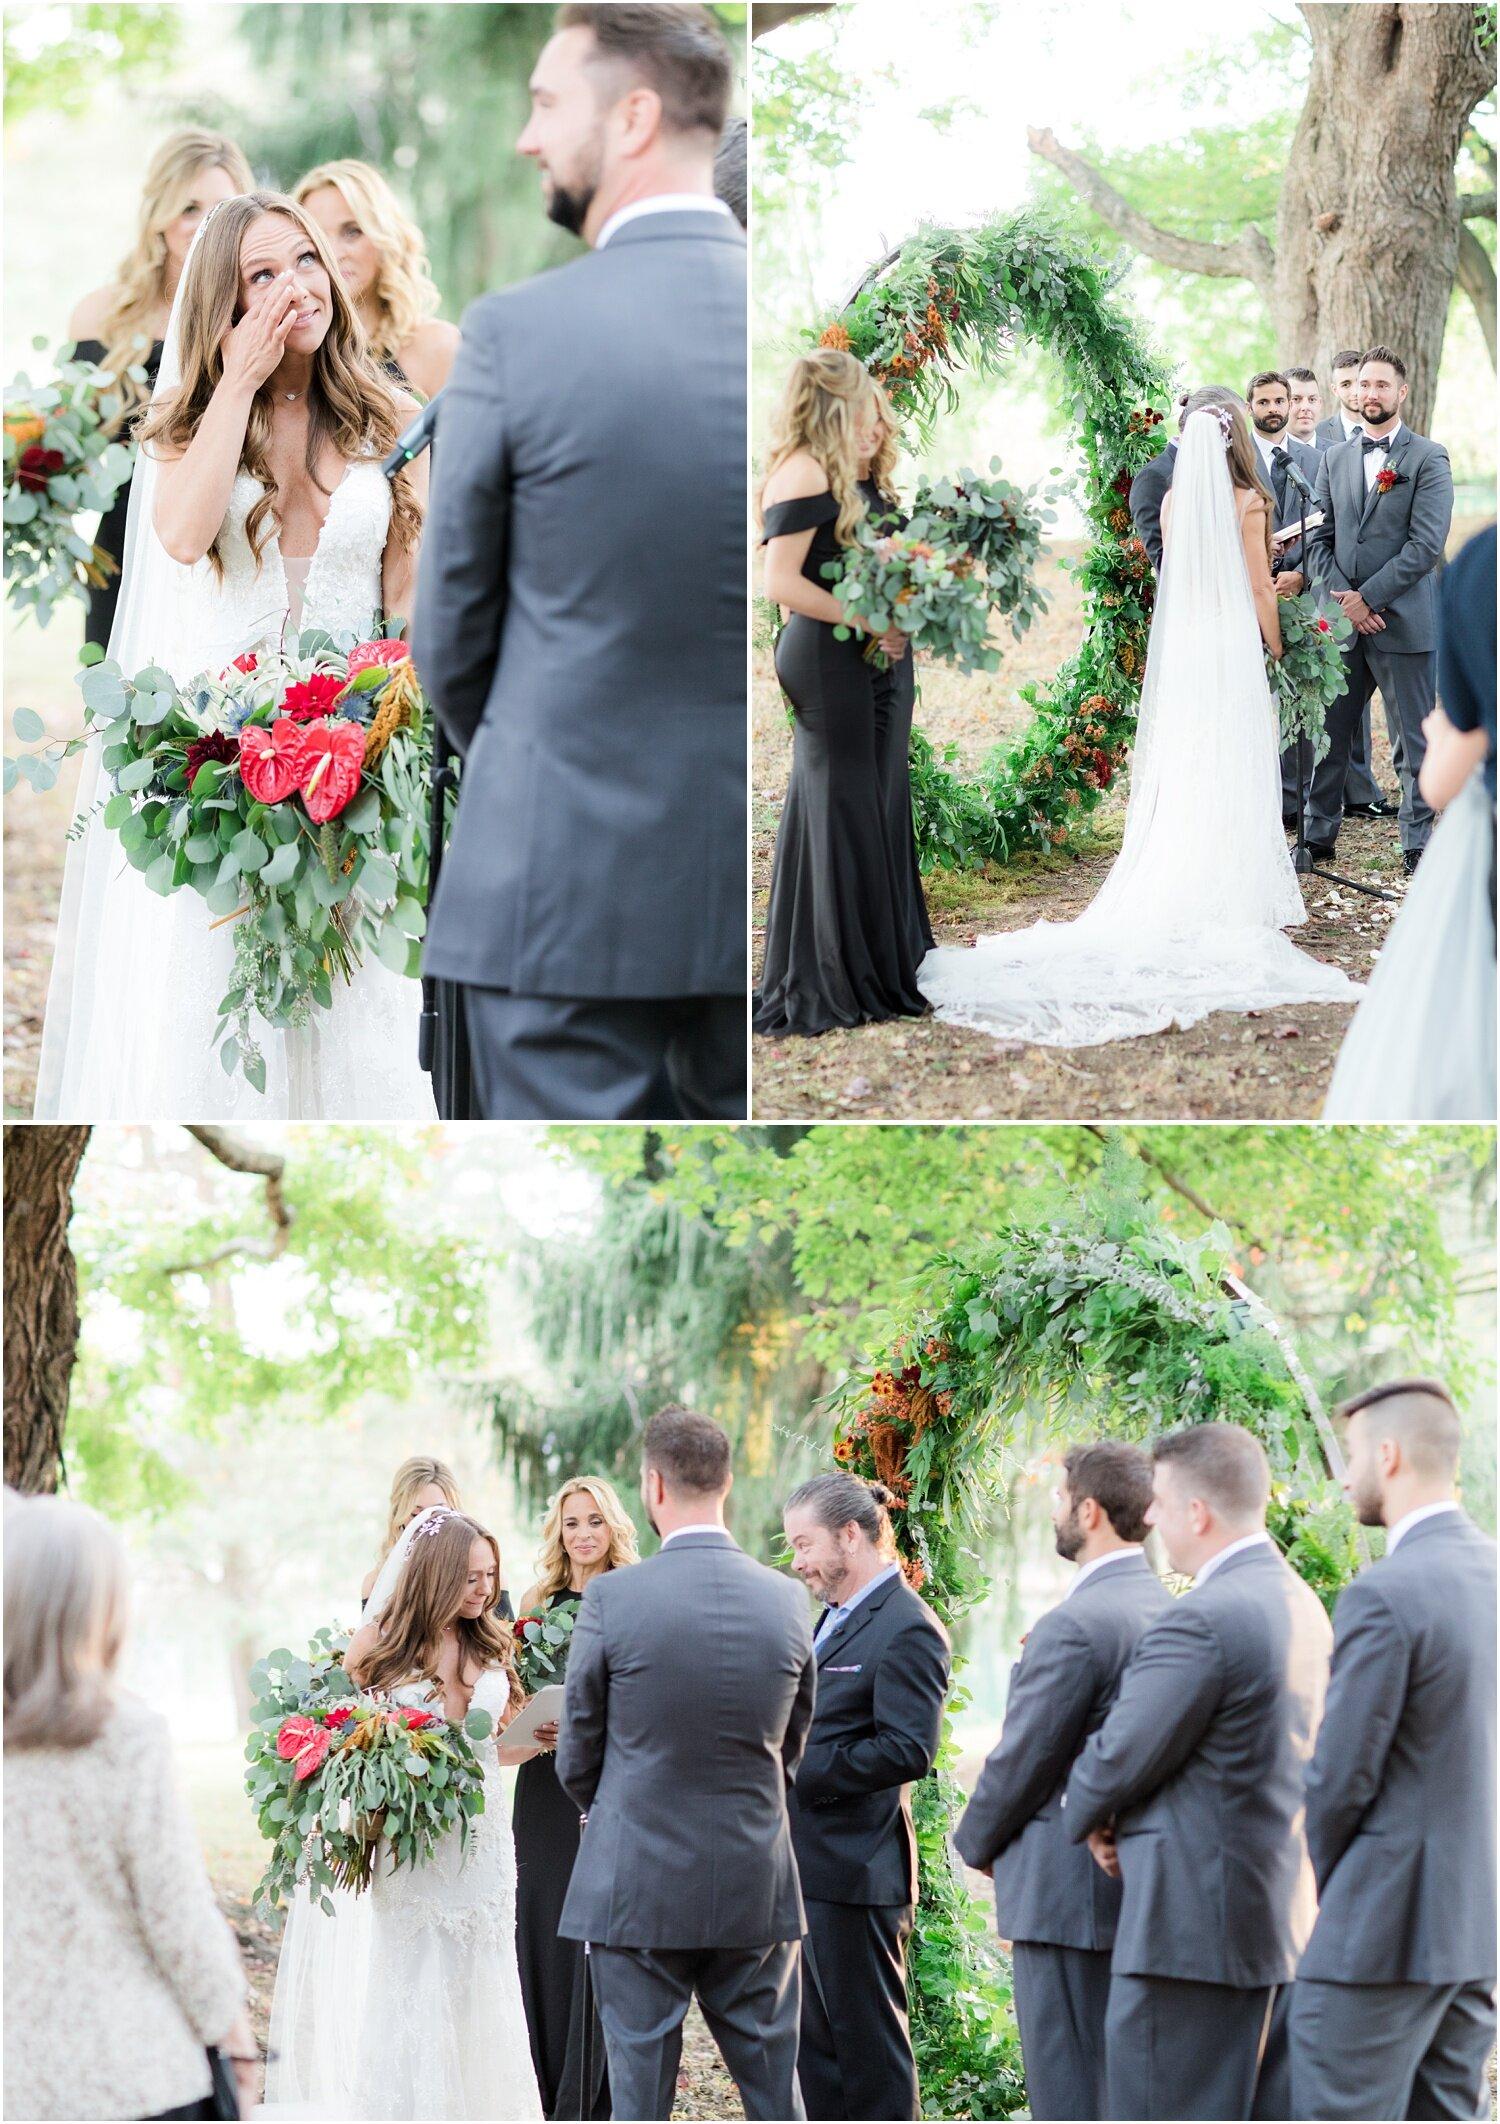 whimsical outdoor wedding ceremony in Millstone, NJ.